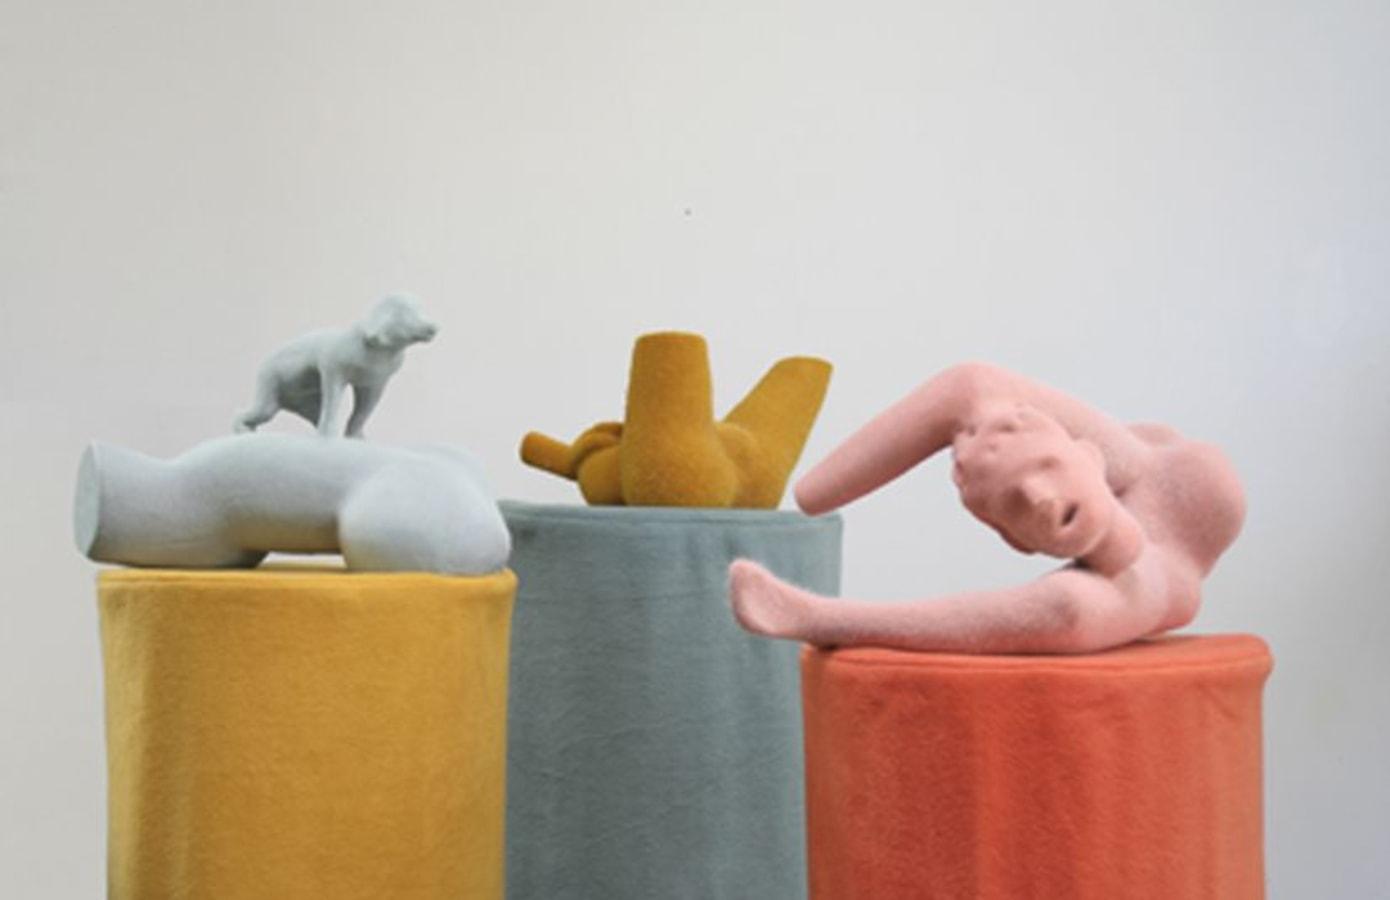 Art Rotterdam 2020, Anastasia Bay, Anton Cotteleer, Hadassah Emmerich, Nancy Moreno, Warre Mulder, Simona Mihaela Stoia,